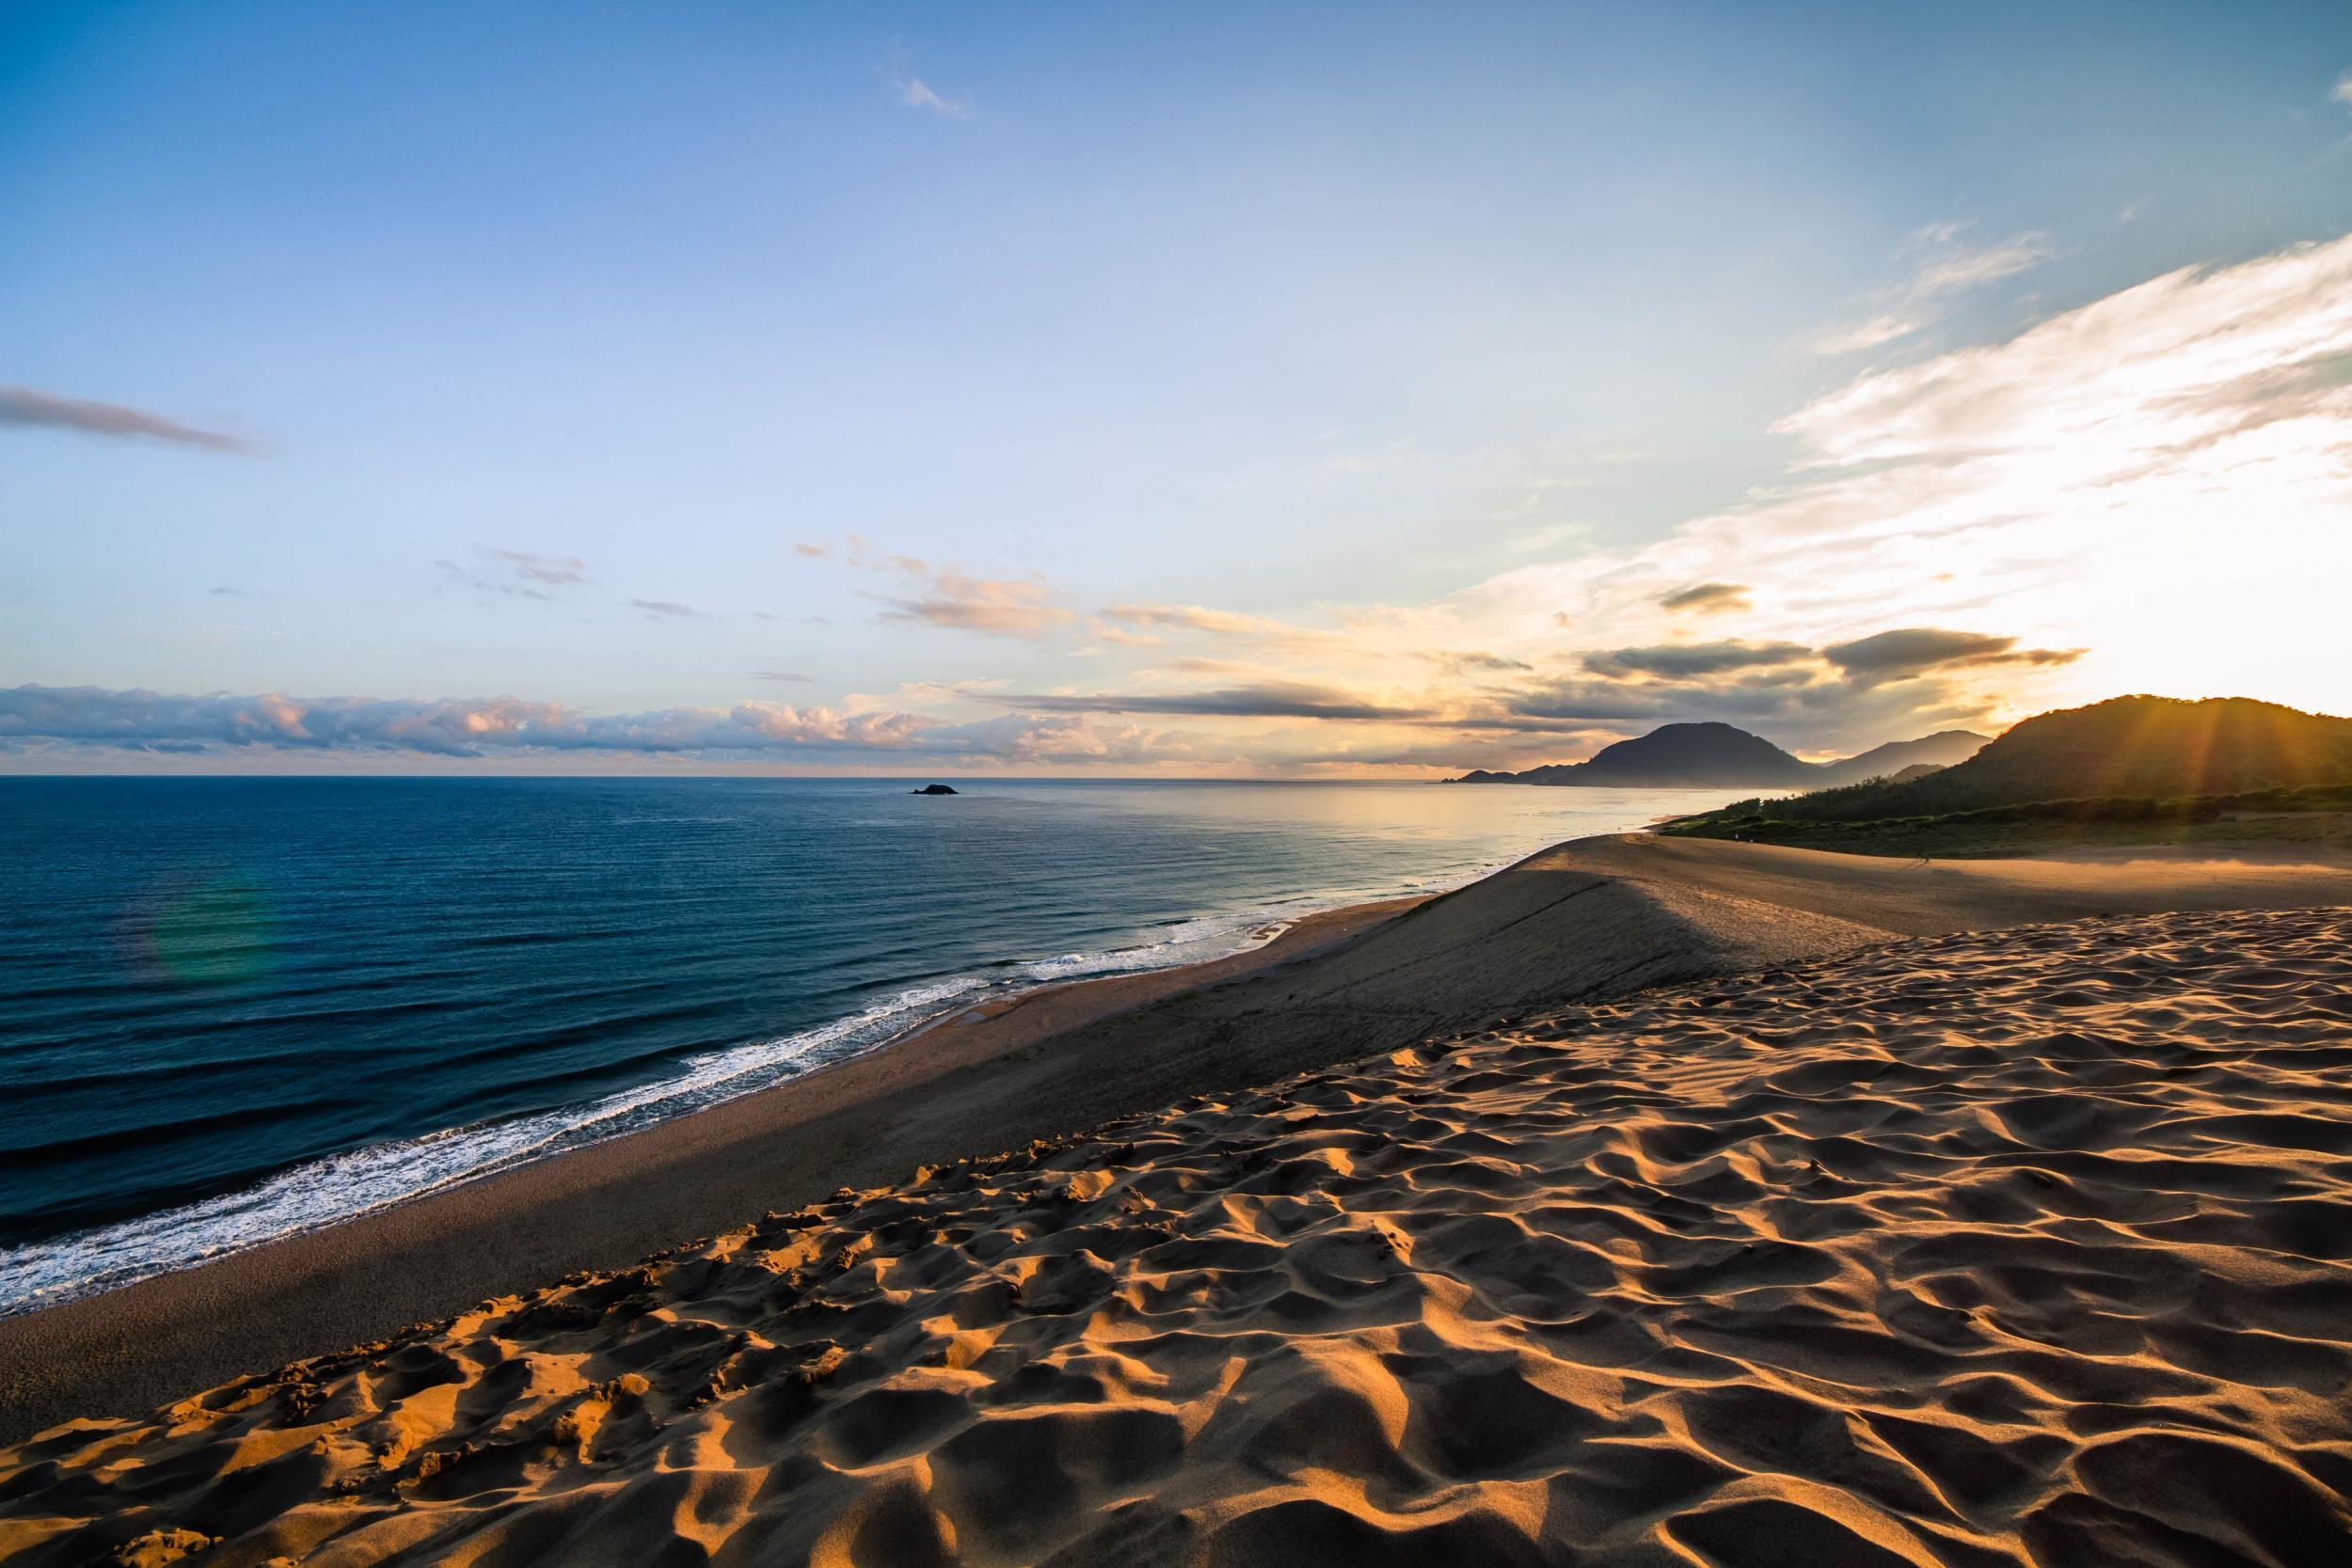 Tourists vandalise ancient Japanese sand dunes